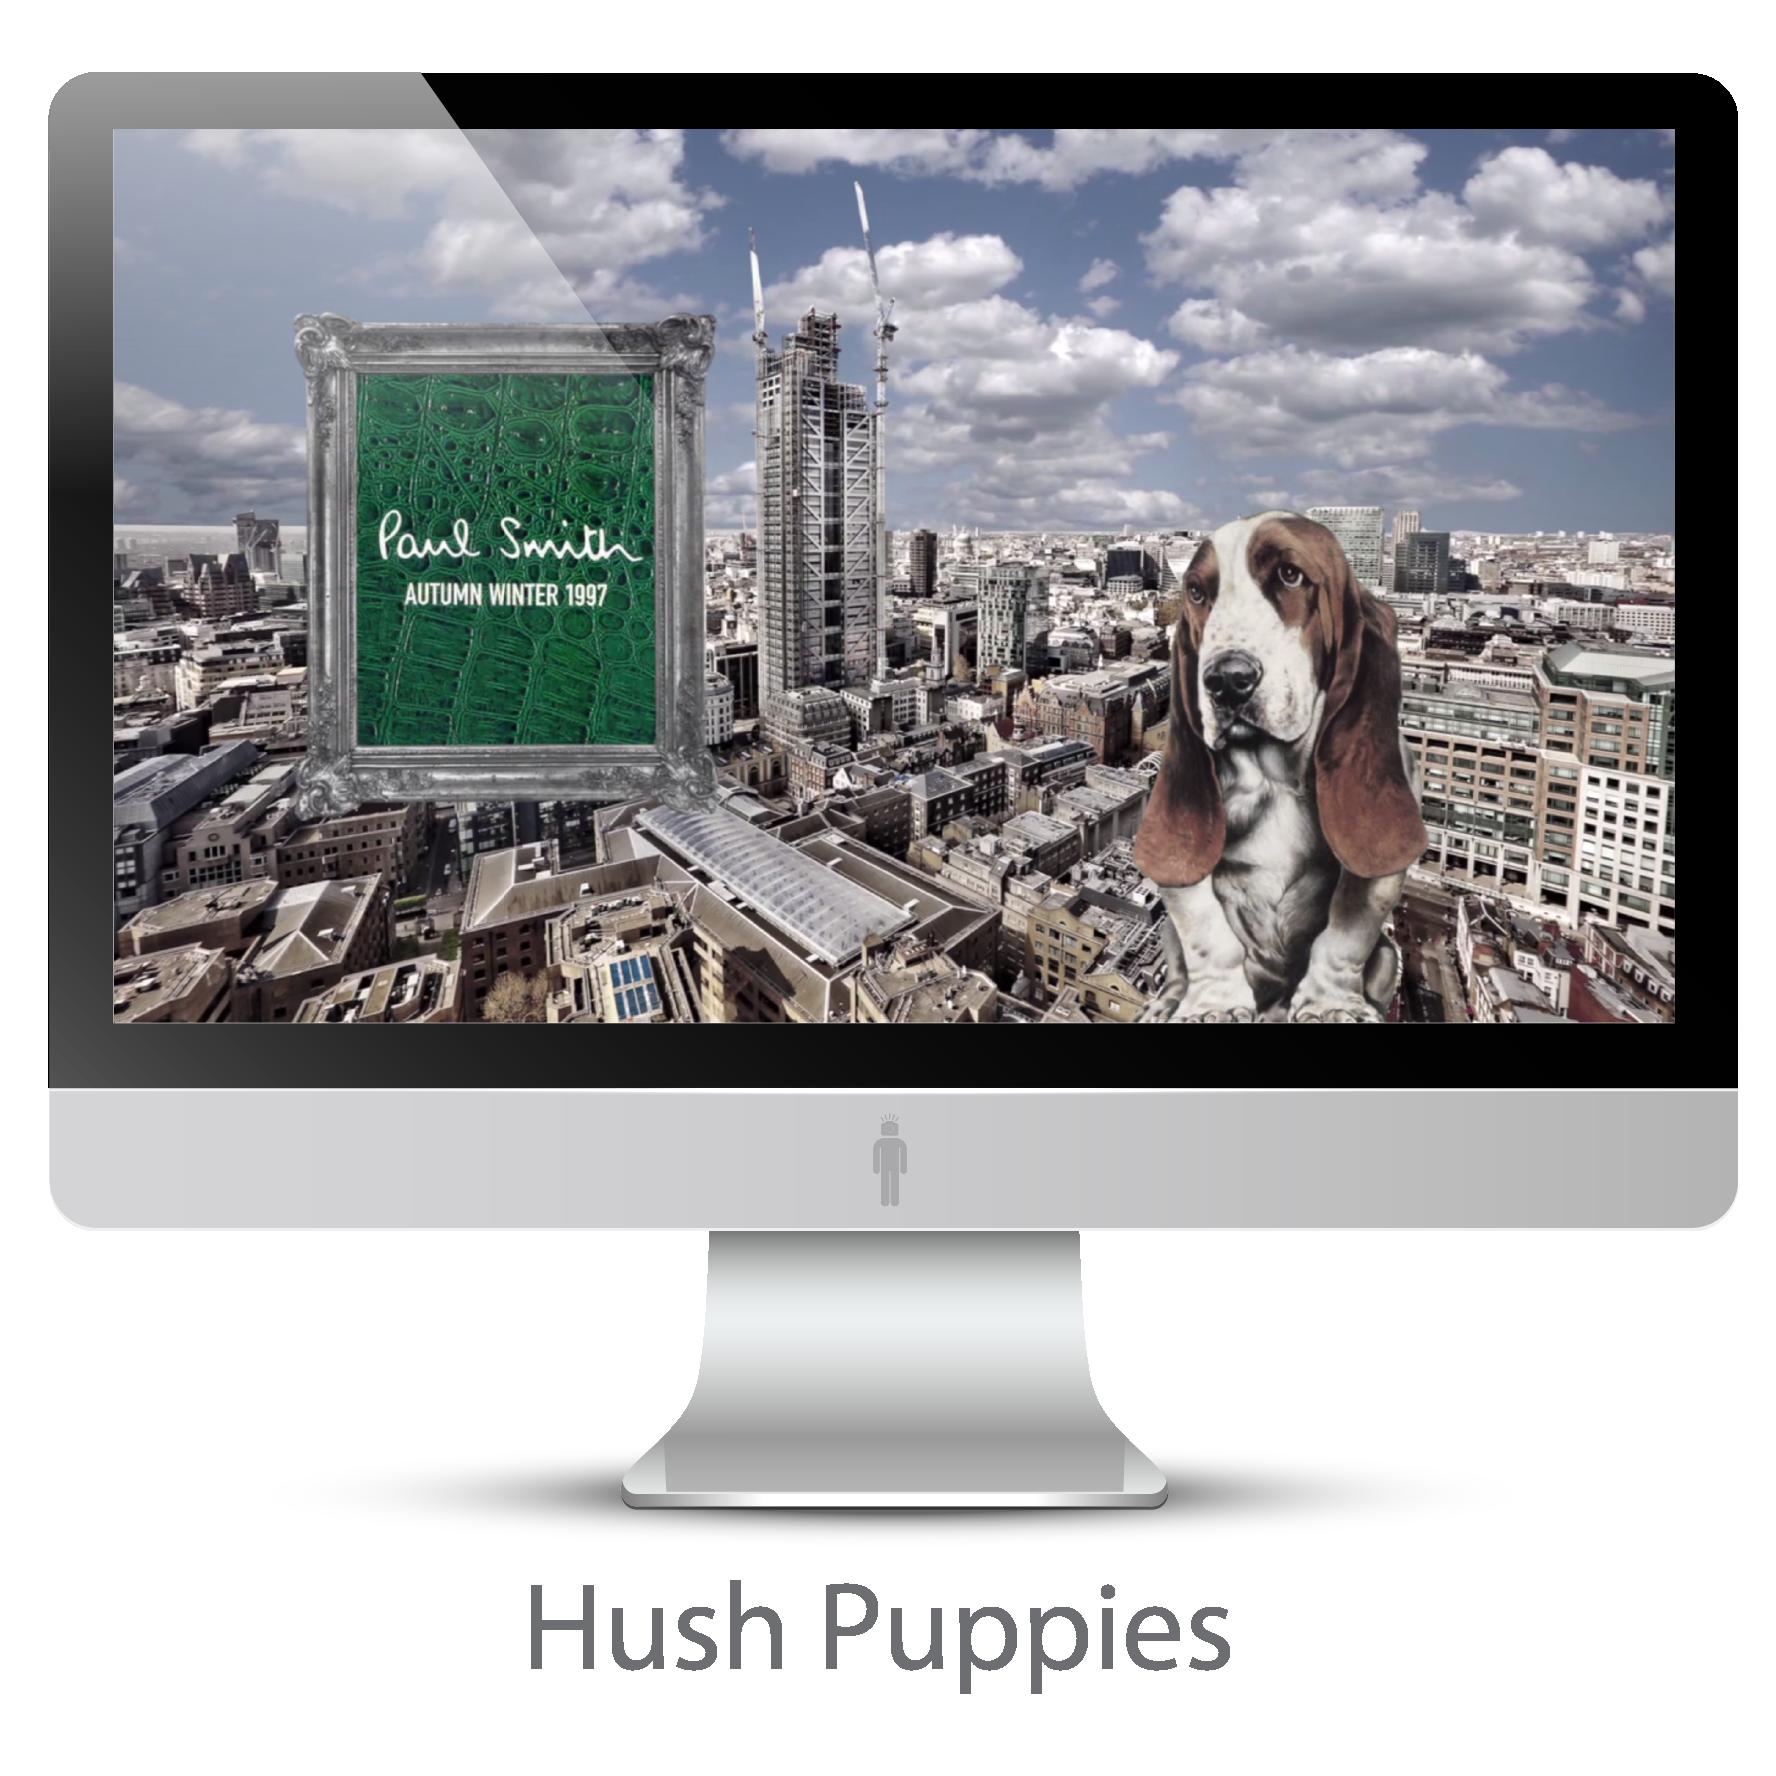 Hush Puppies training video